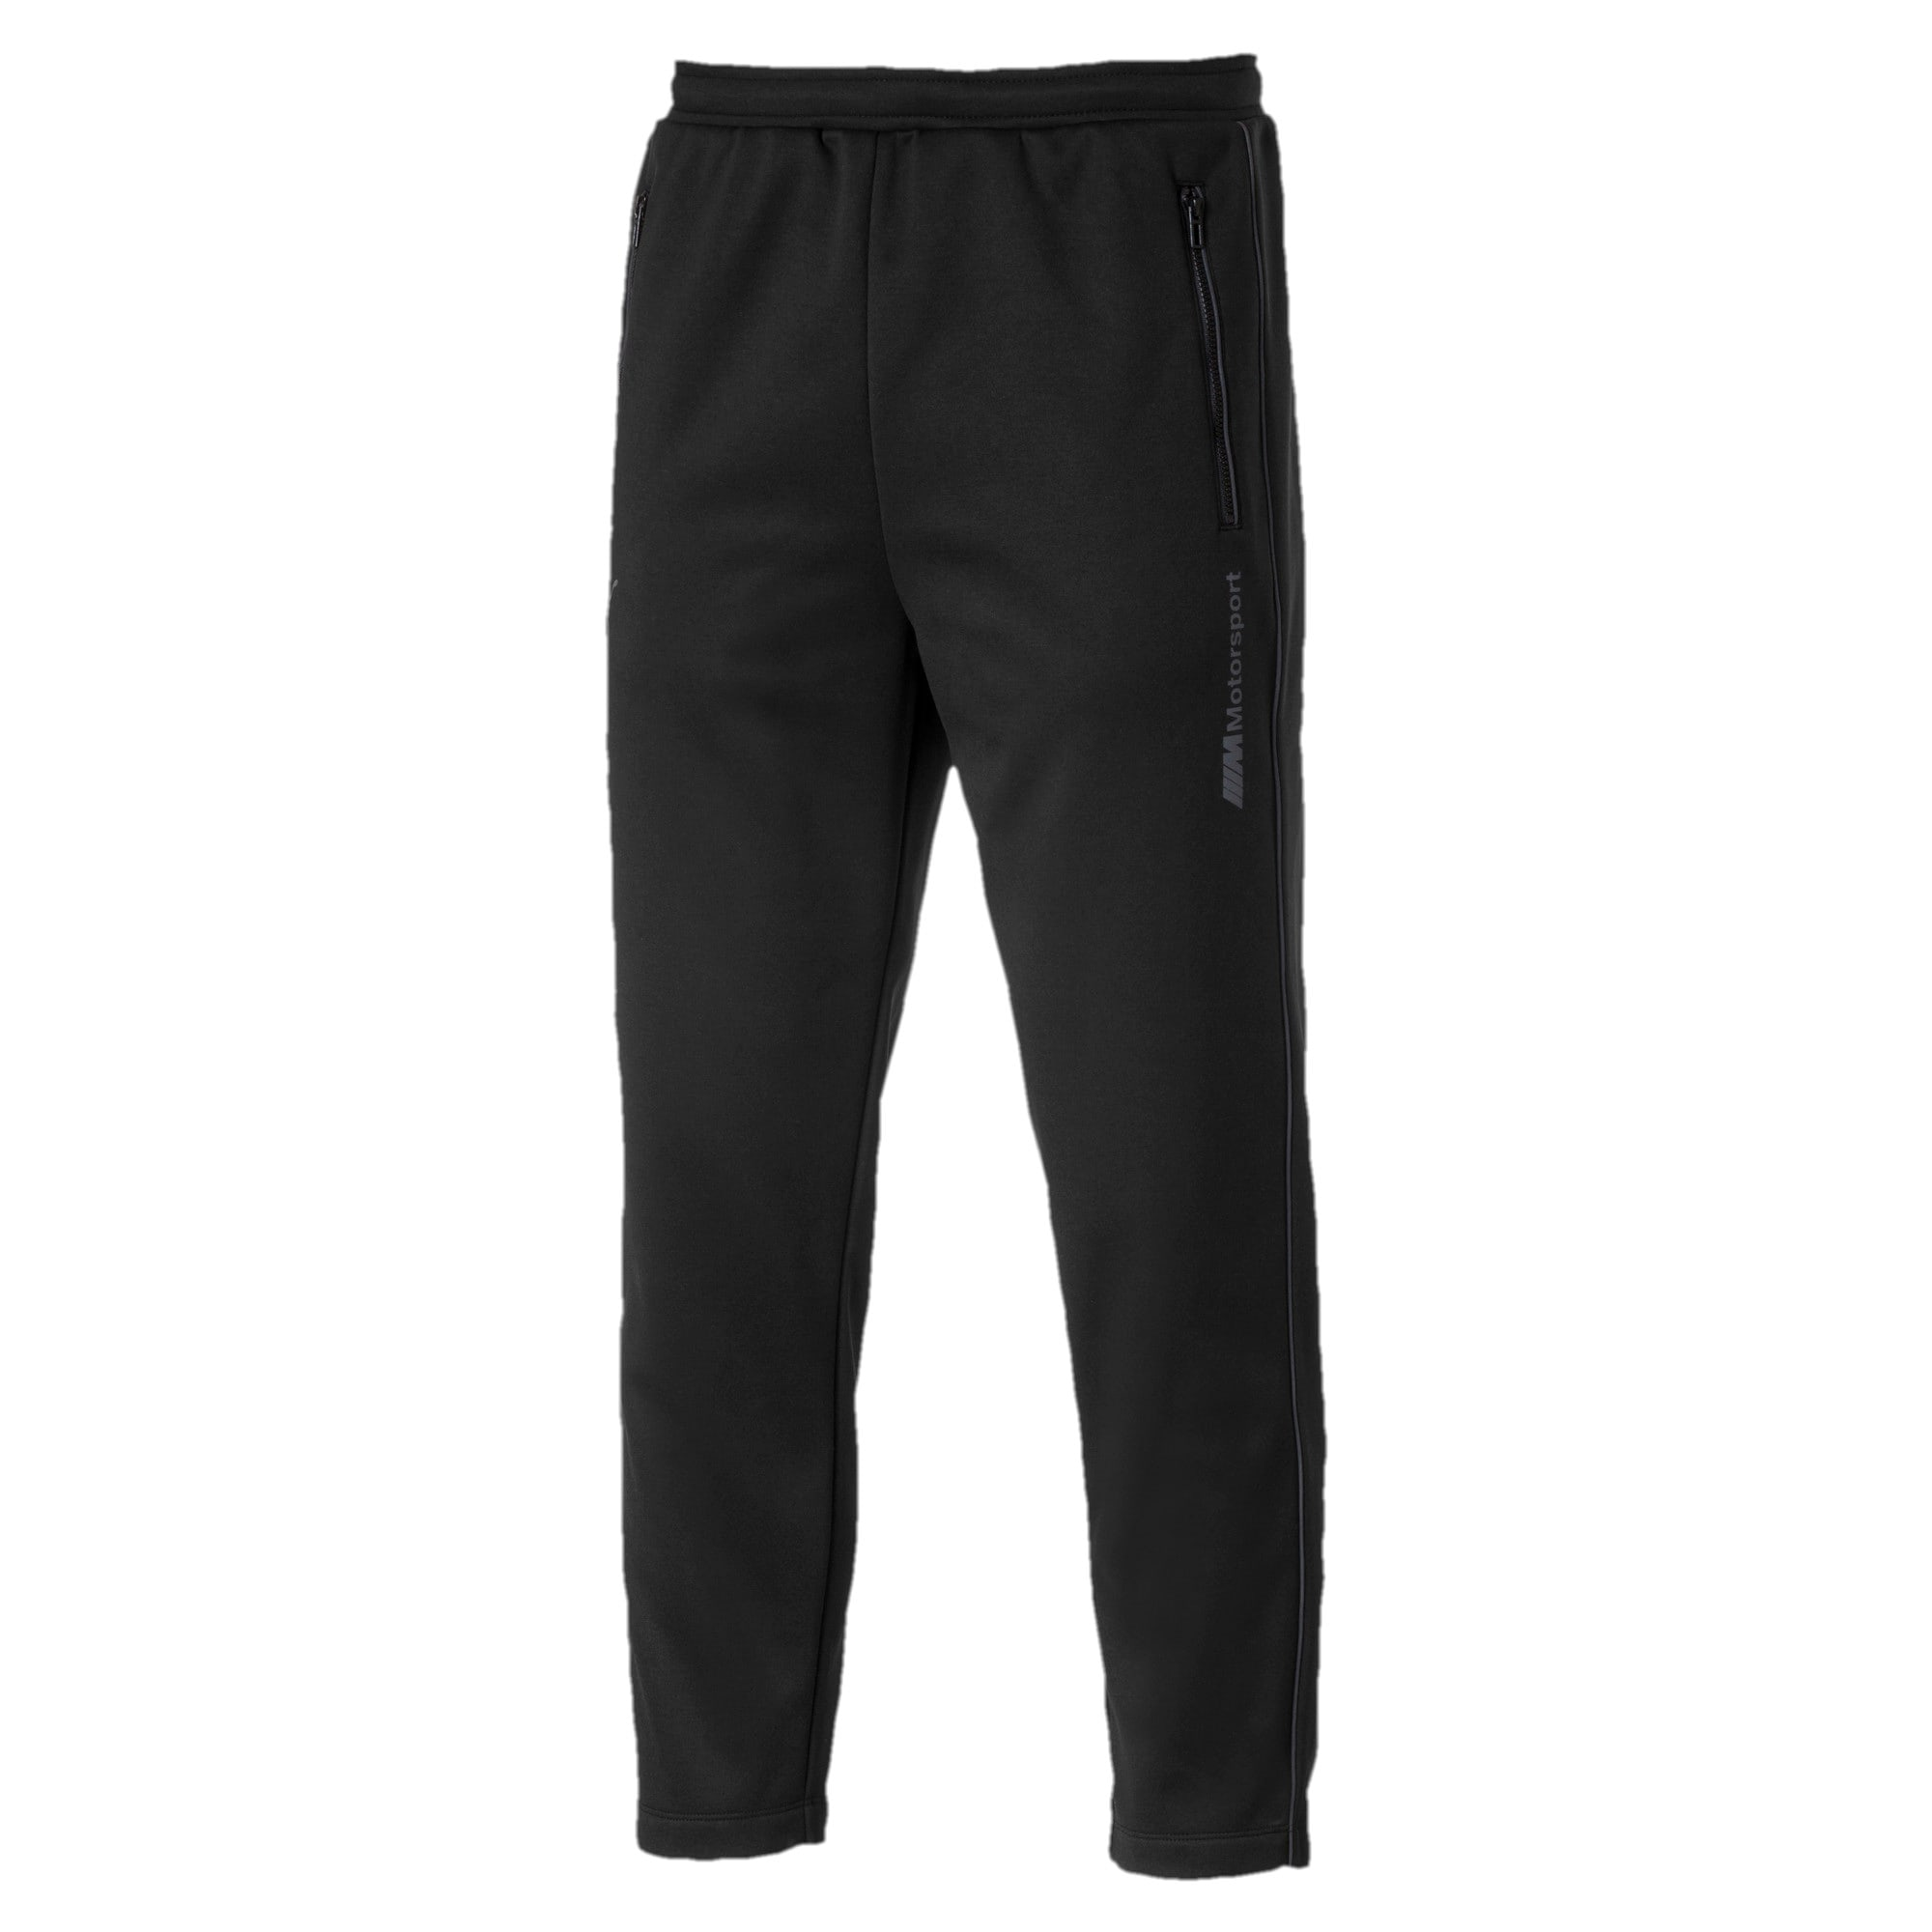 Thumbnail 1 of BMW Motorsport Life Men's Sweatpants, Puma Black, medium